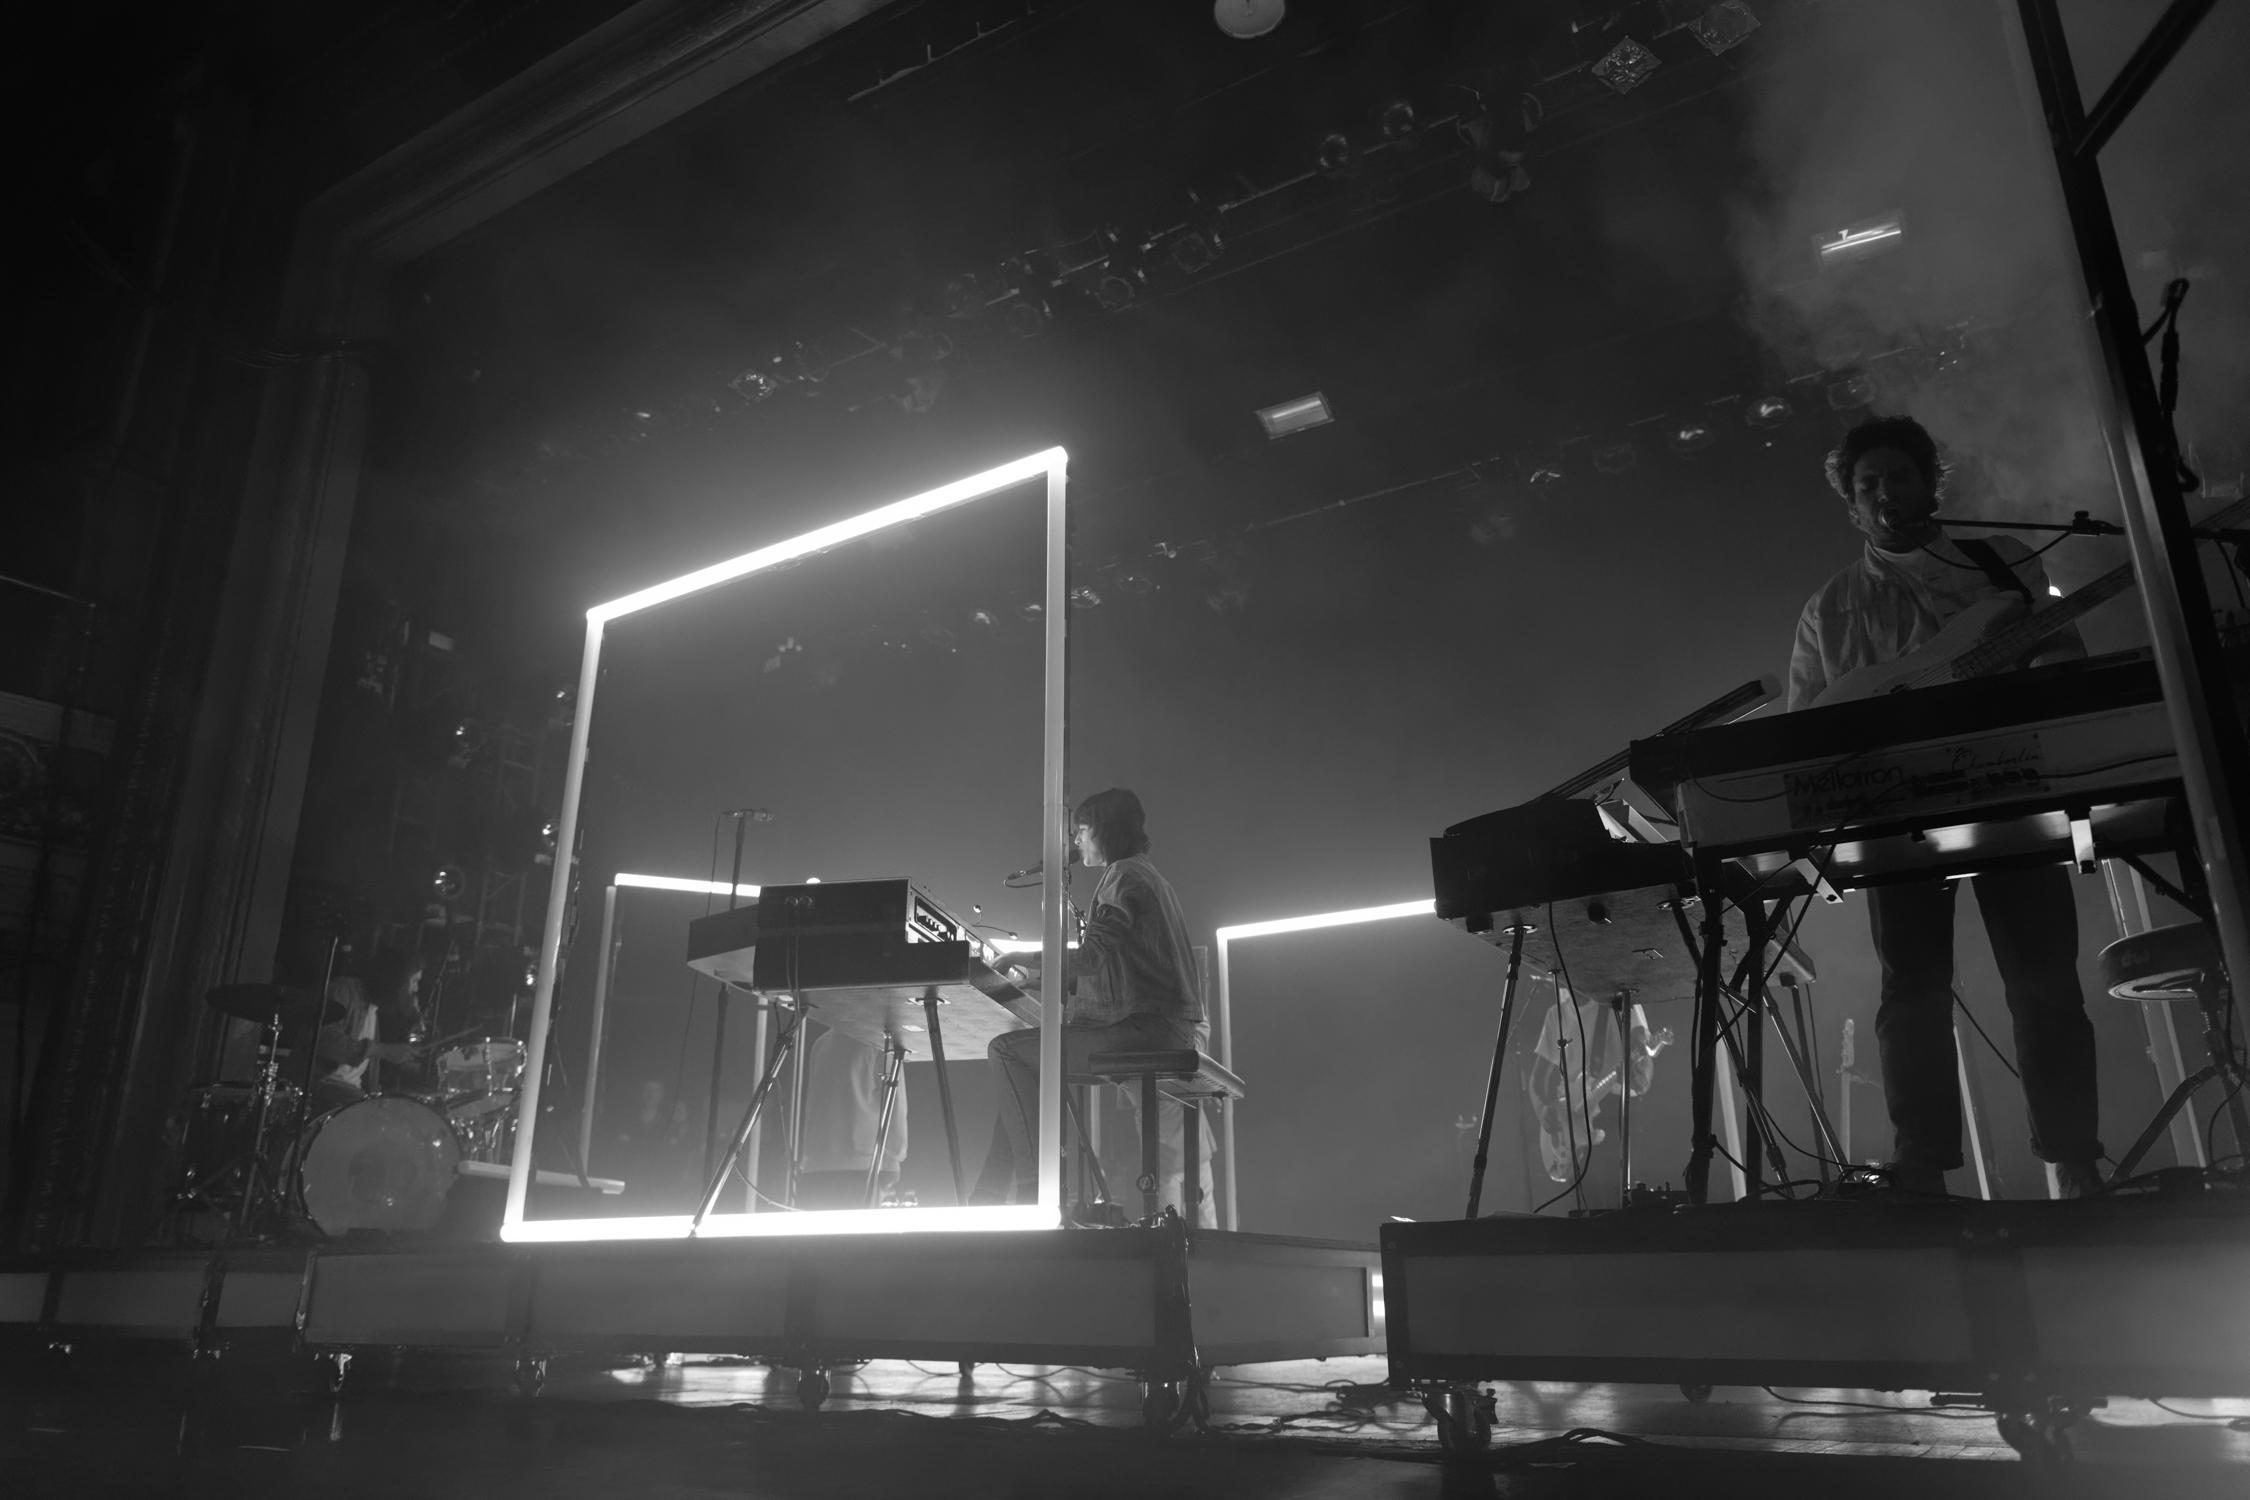 20190415 128 The Regency Ballroom - Charlotte Gainsbourg by Jon Bauer.jpg